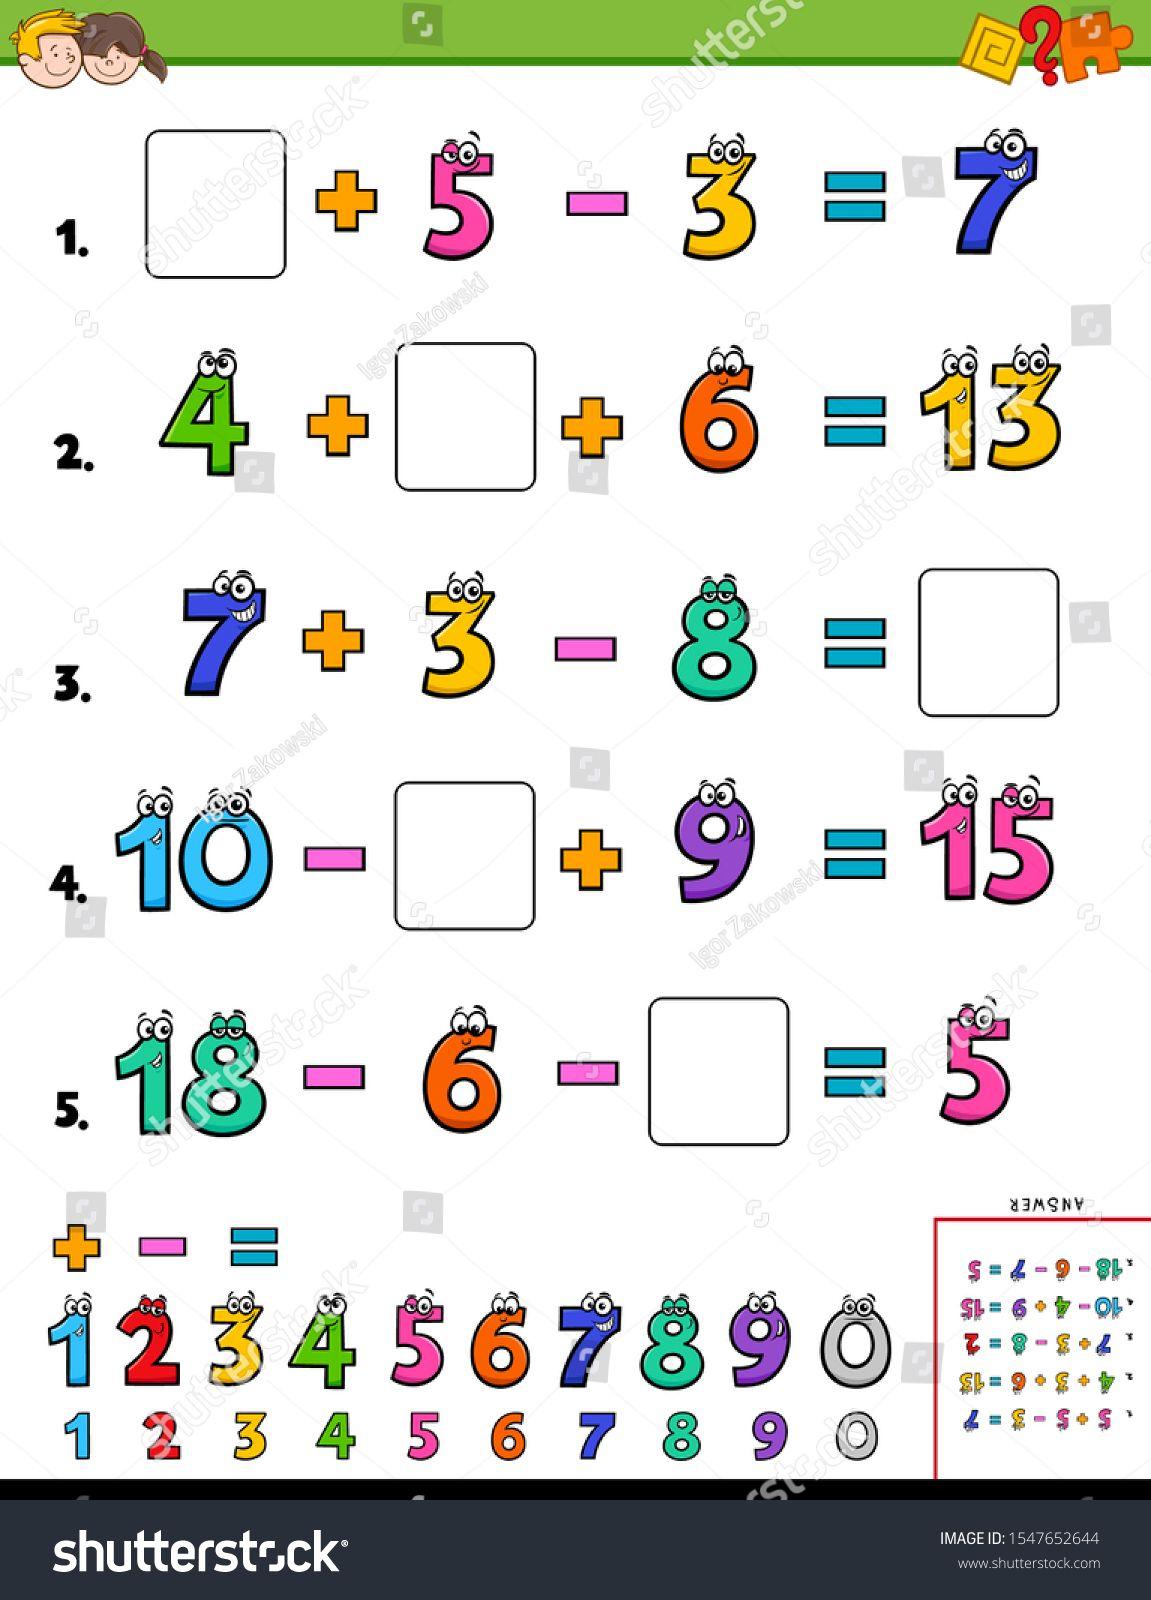 Cartoon Illustration Of Educational Mathematical